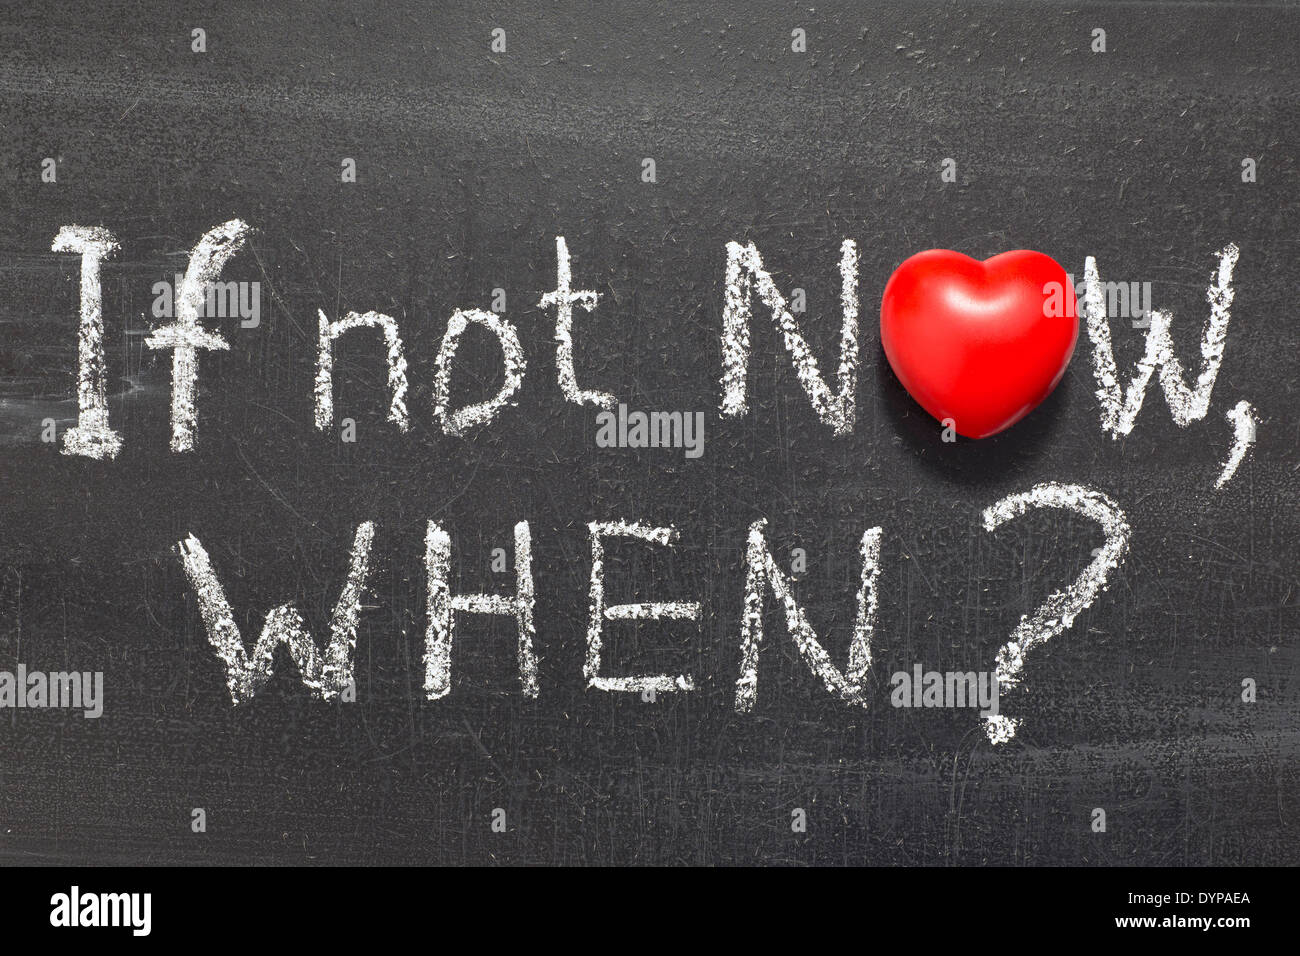 If not now when question handwritten on chalkboard with heart if not now when question handwritten on chalkboard with heart symbol instead of o biocorpaavc